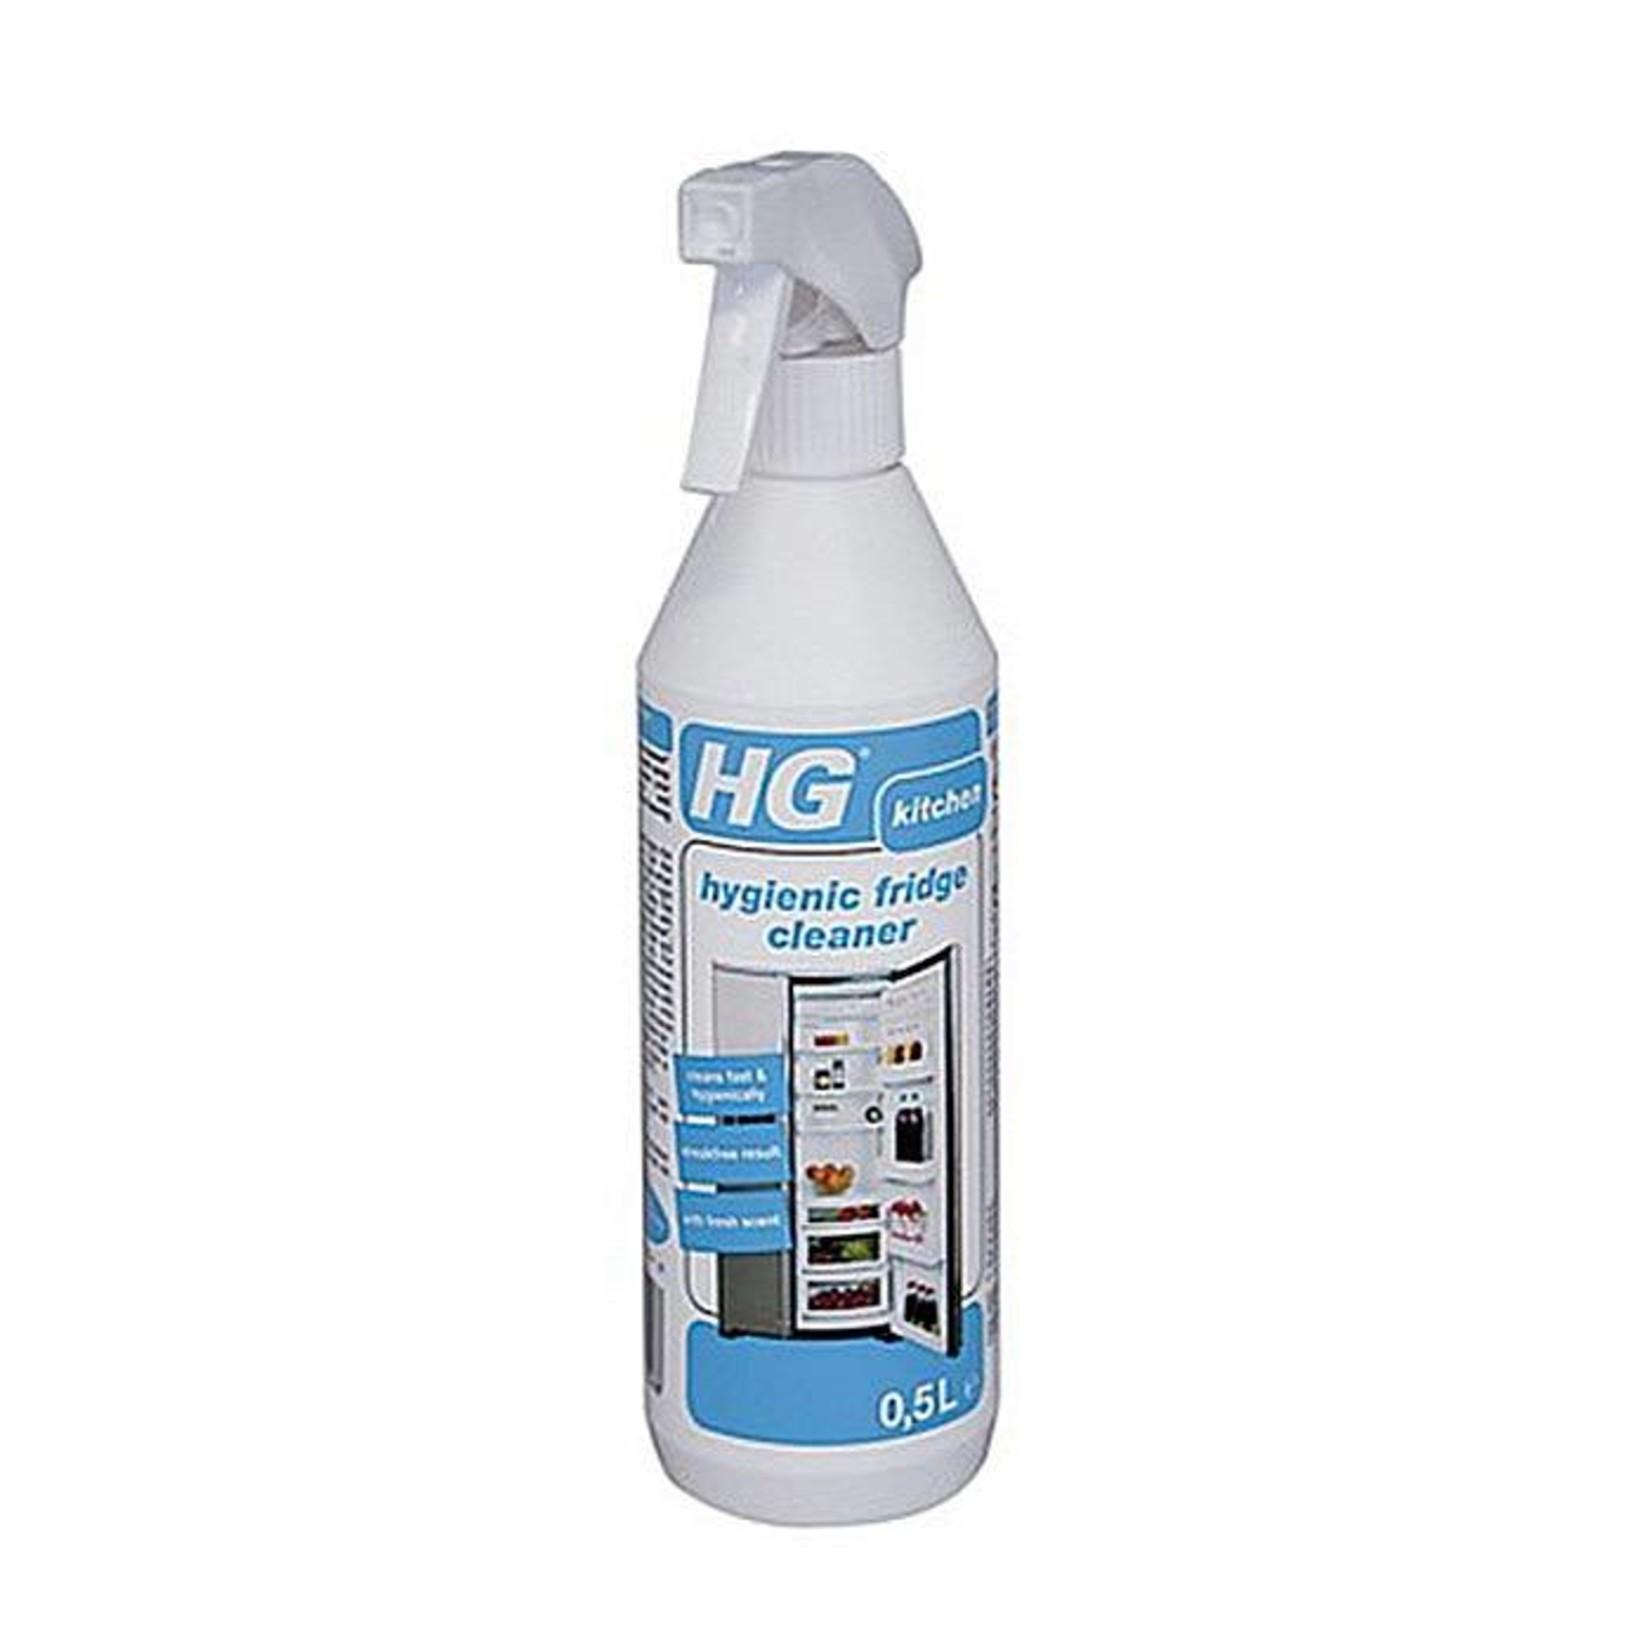 HG HG HYGIENIC FRIDGE CLEANER KITCHEN